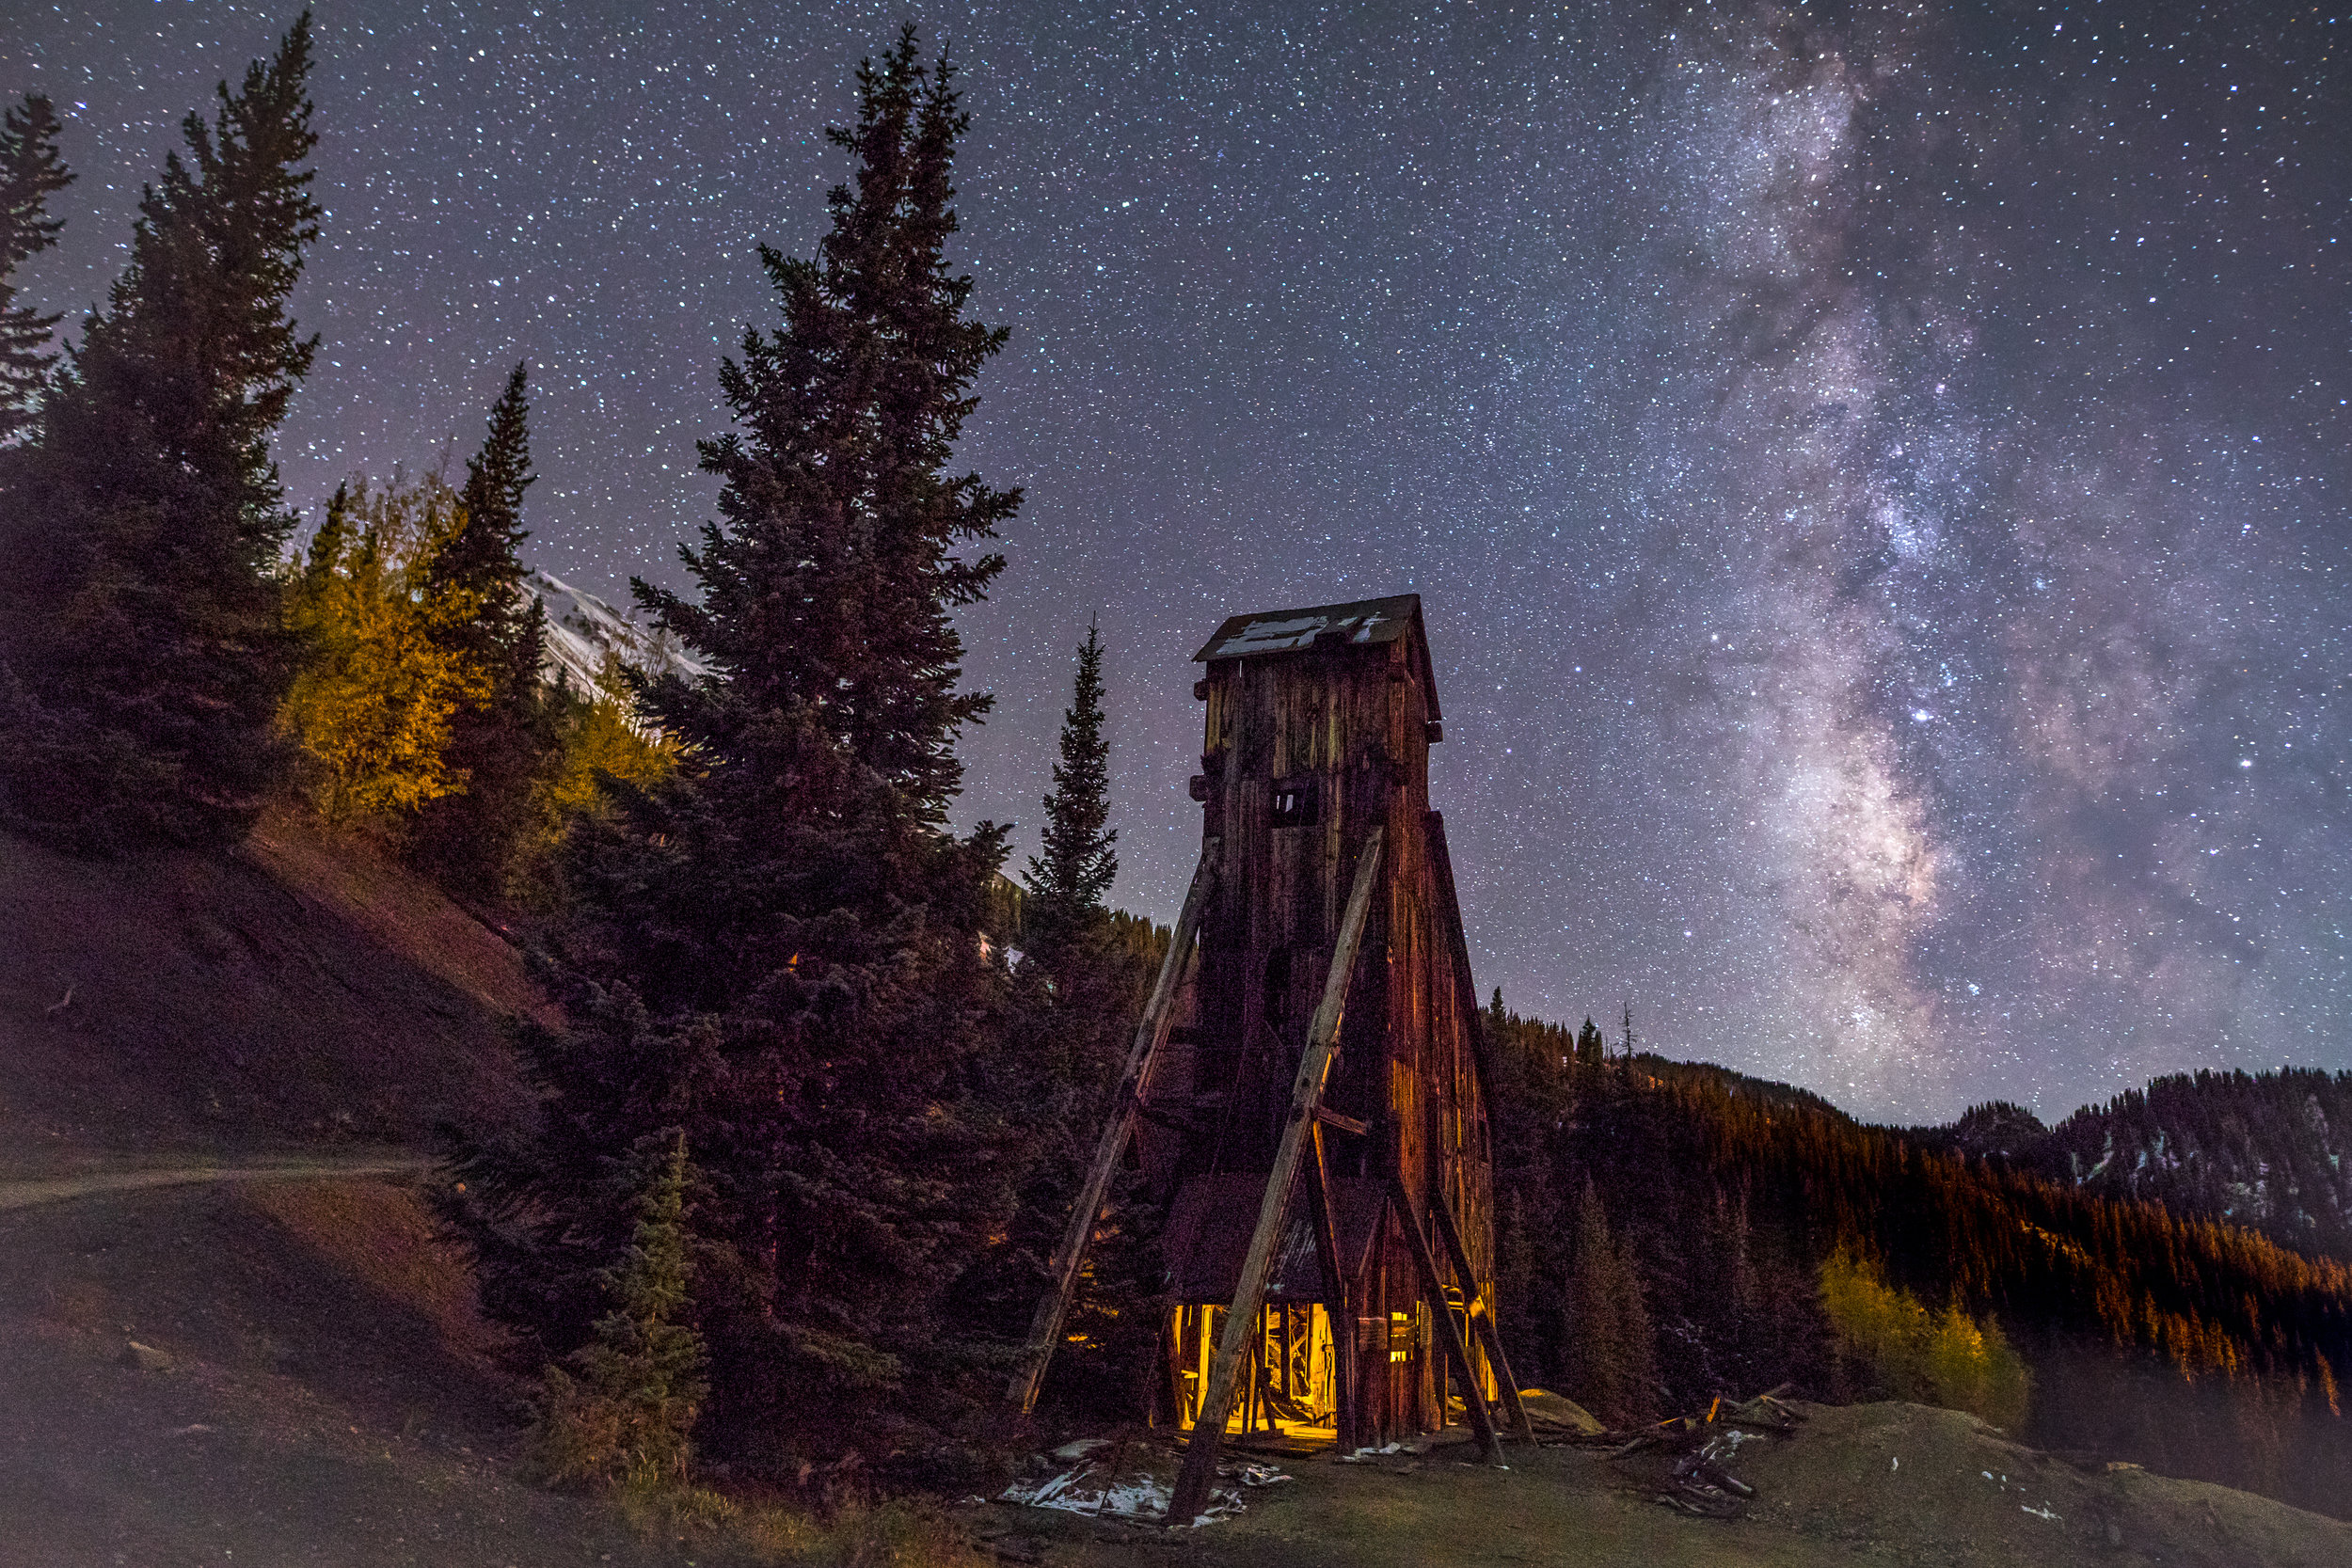 Milky way over Yankee Girl Mine, Image # 5505